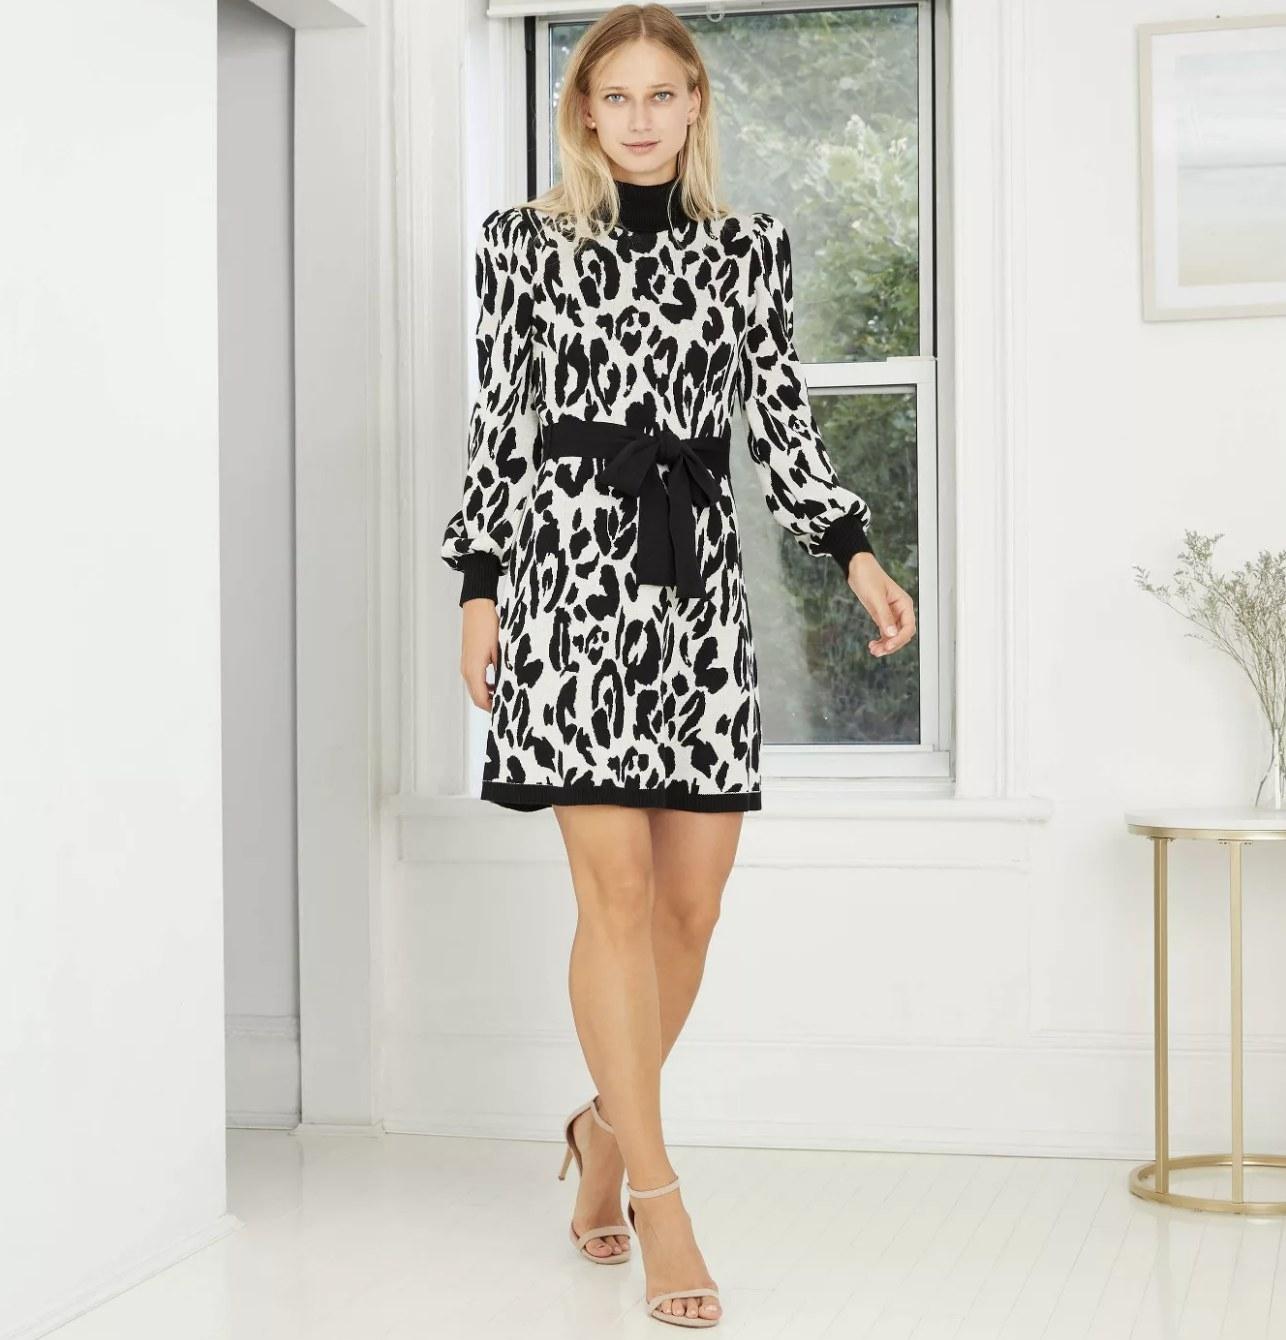 zebra print sweater-dress with black belt